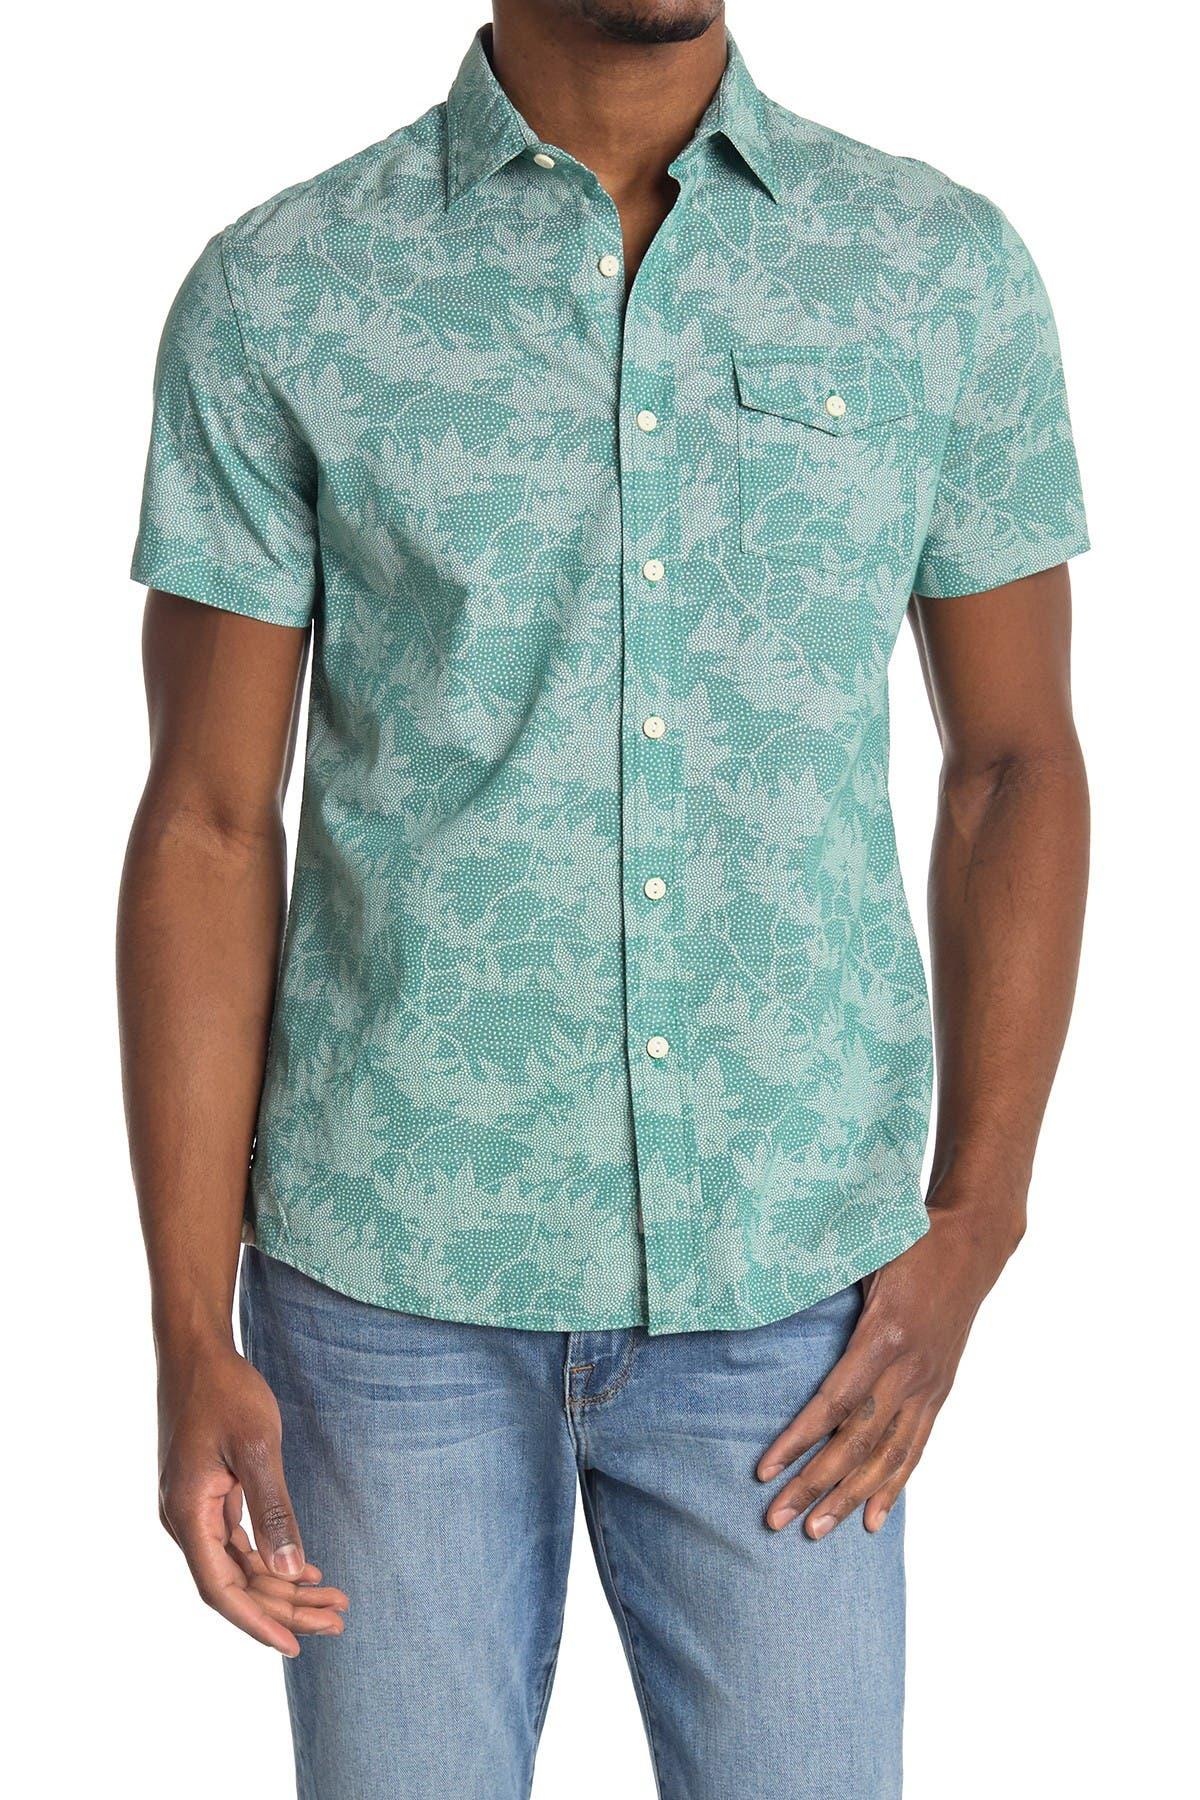 Image of Grayers Camo Leaf Short Sleeve Shirt